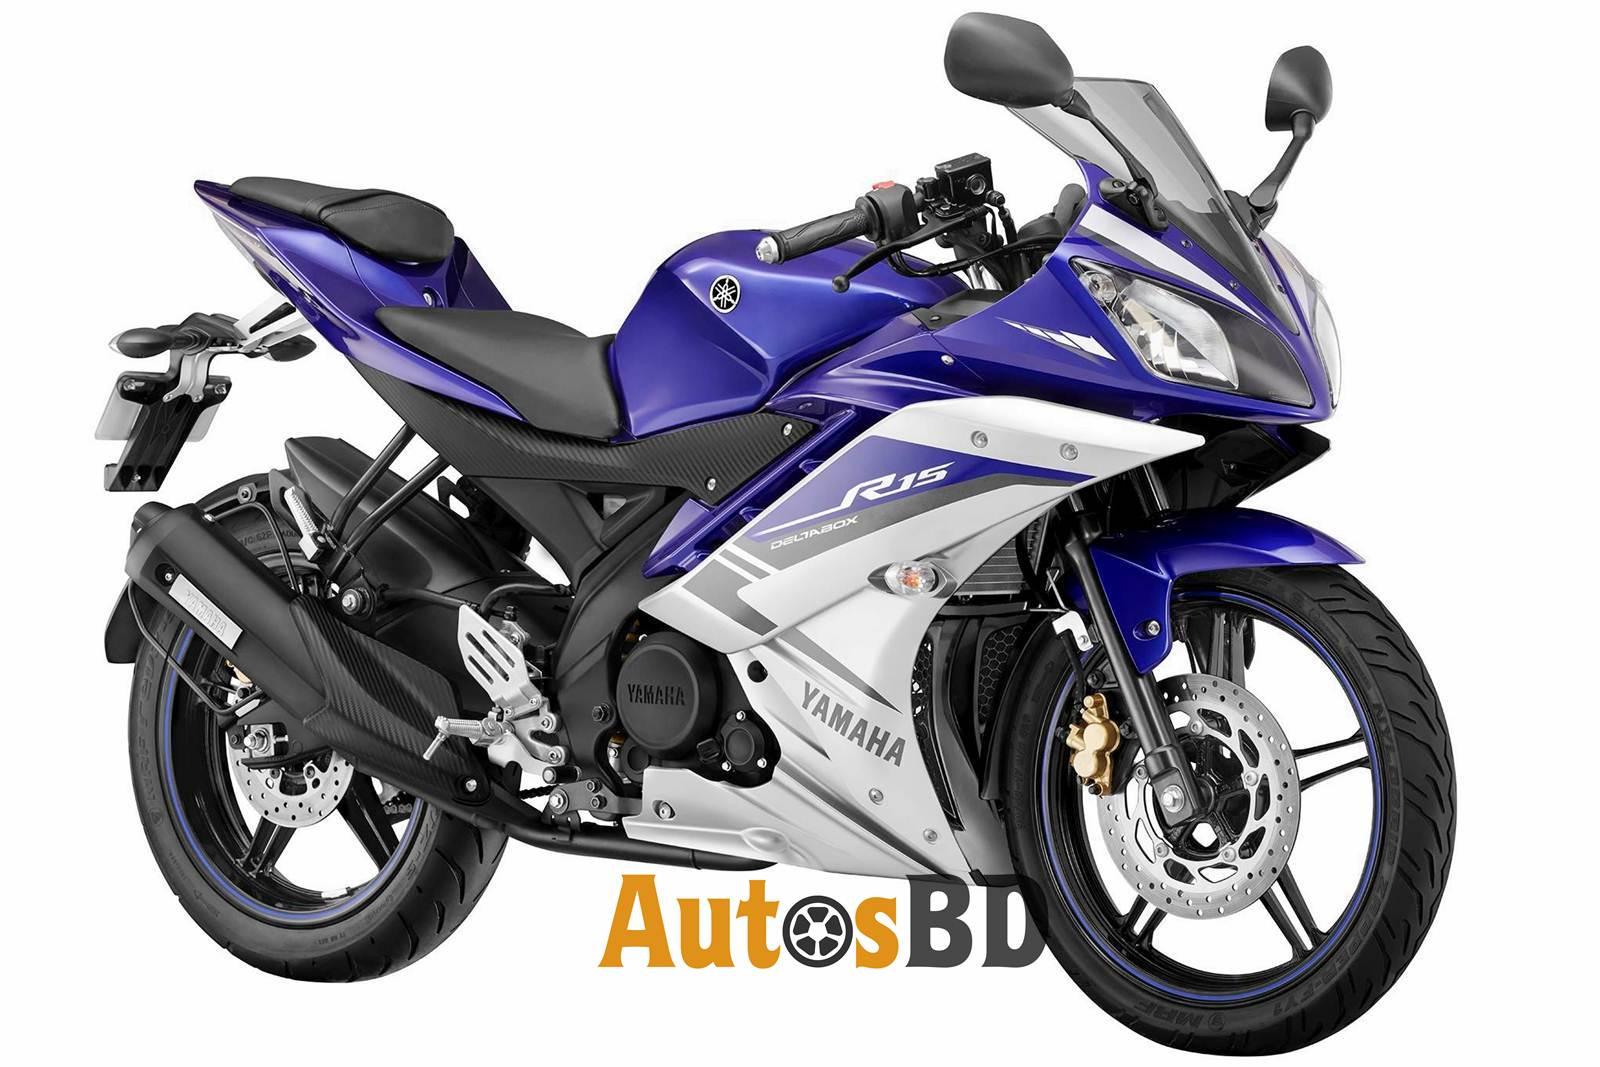 Yamaha R15 V2 Motorcycle Specification